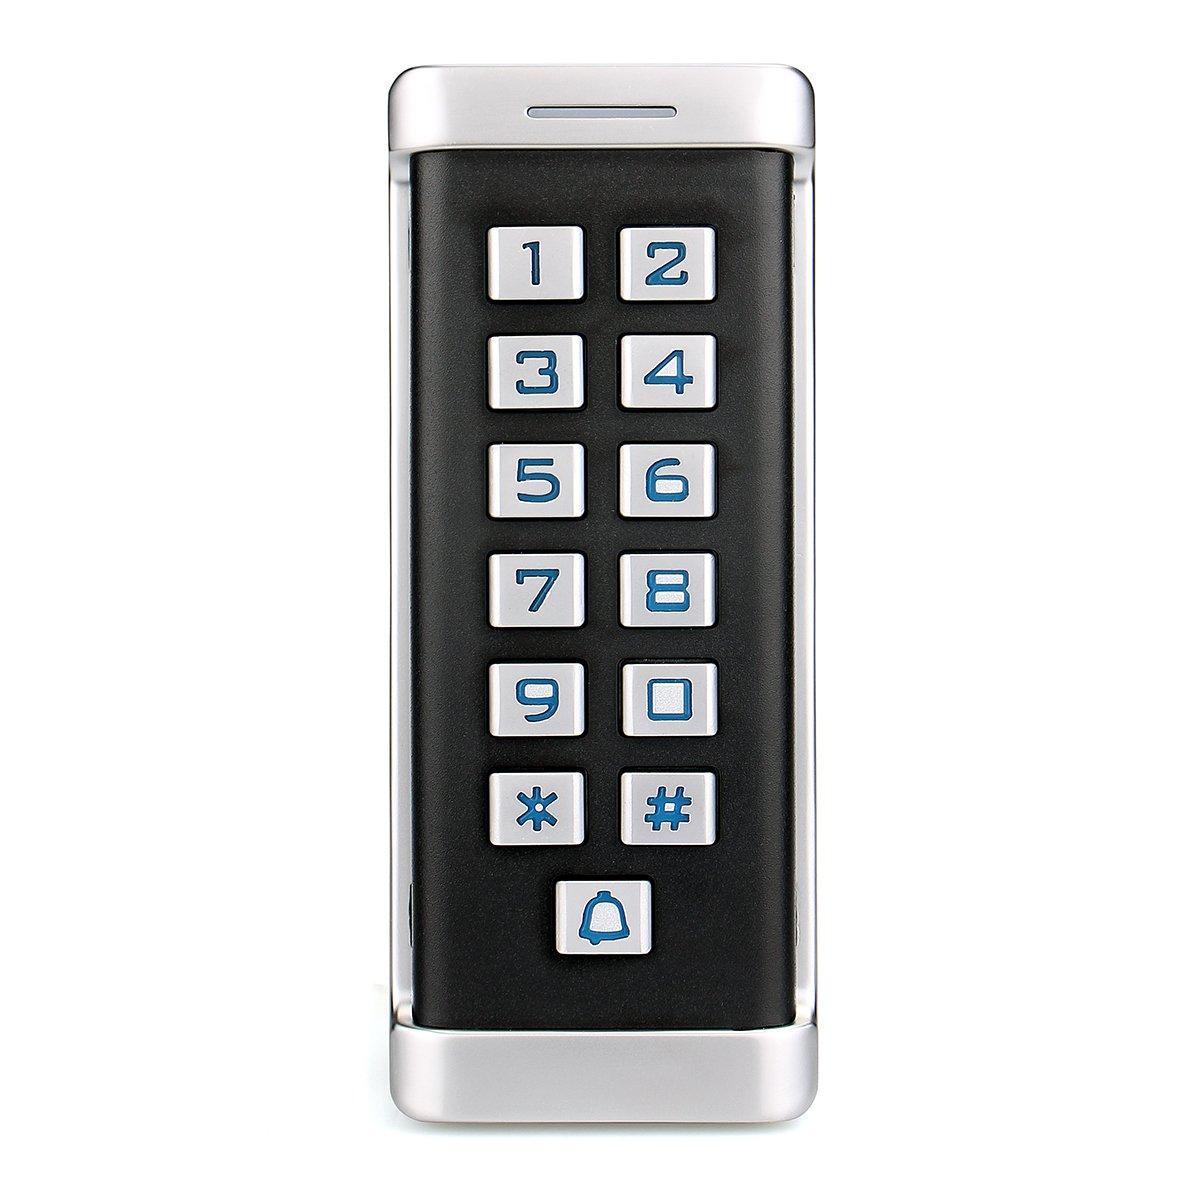 Retekess H1EM-W Access Control Keypad Door Access Control RFID Access Control Standalone Keypad IP68 Waterproof Wiegand 26-bit 2000 Users Single Door by Retekess